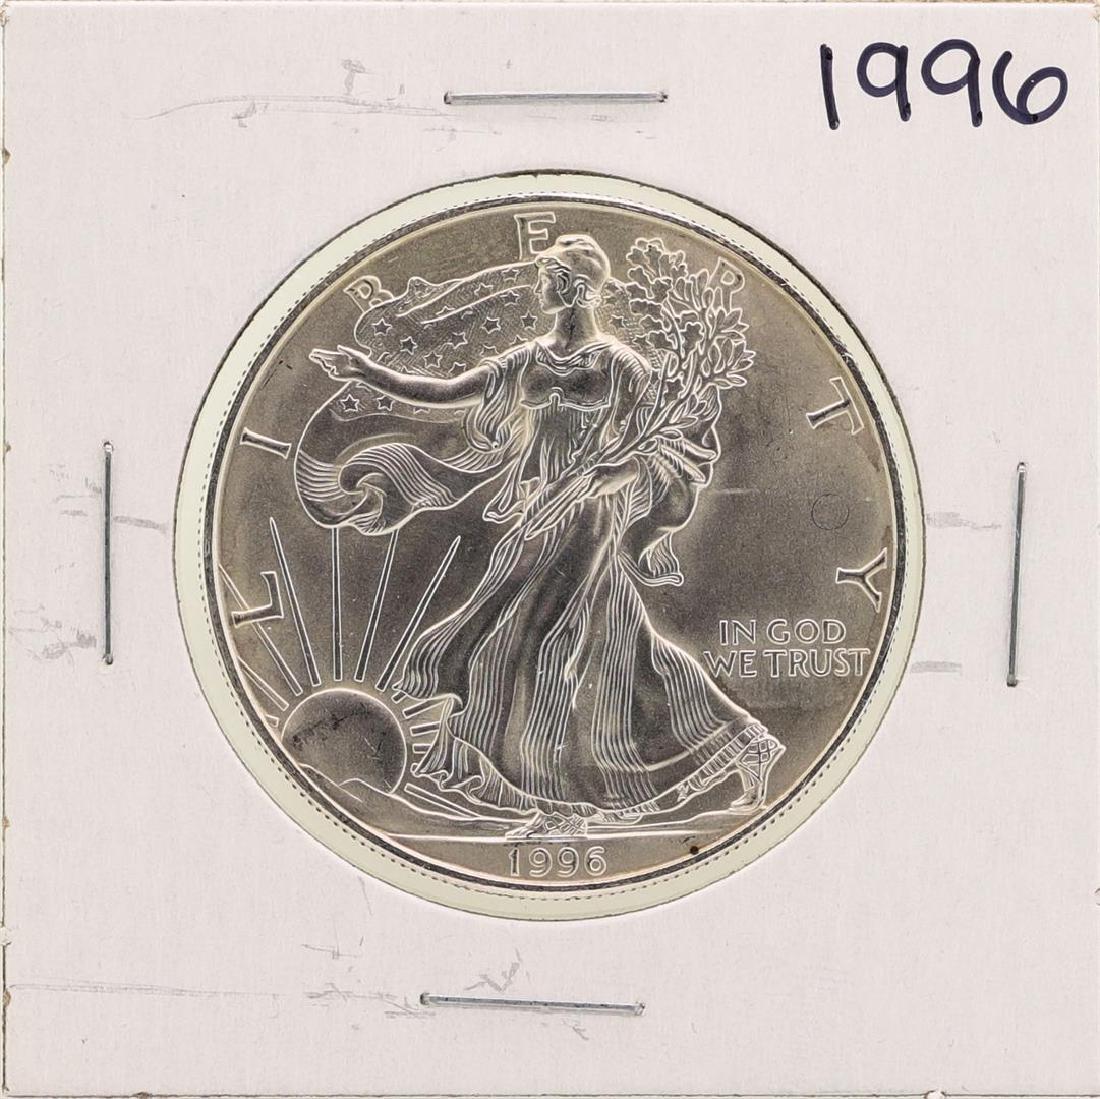 1996 $1 American Silver Eagle Coins